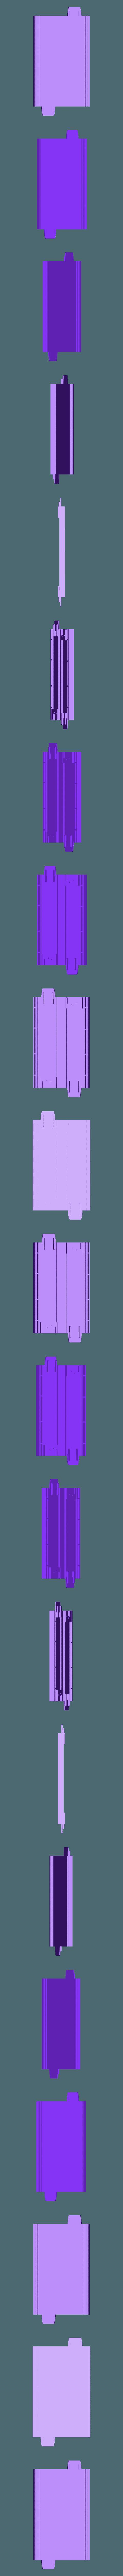 Racetrack_Straight.stl Download free STL file Press Fit Hotwheels Roads • Model to 3D print, sjpiper145